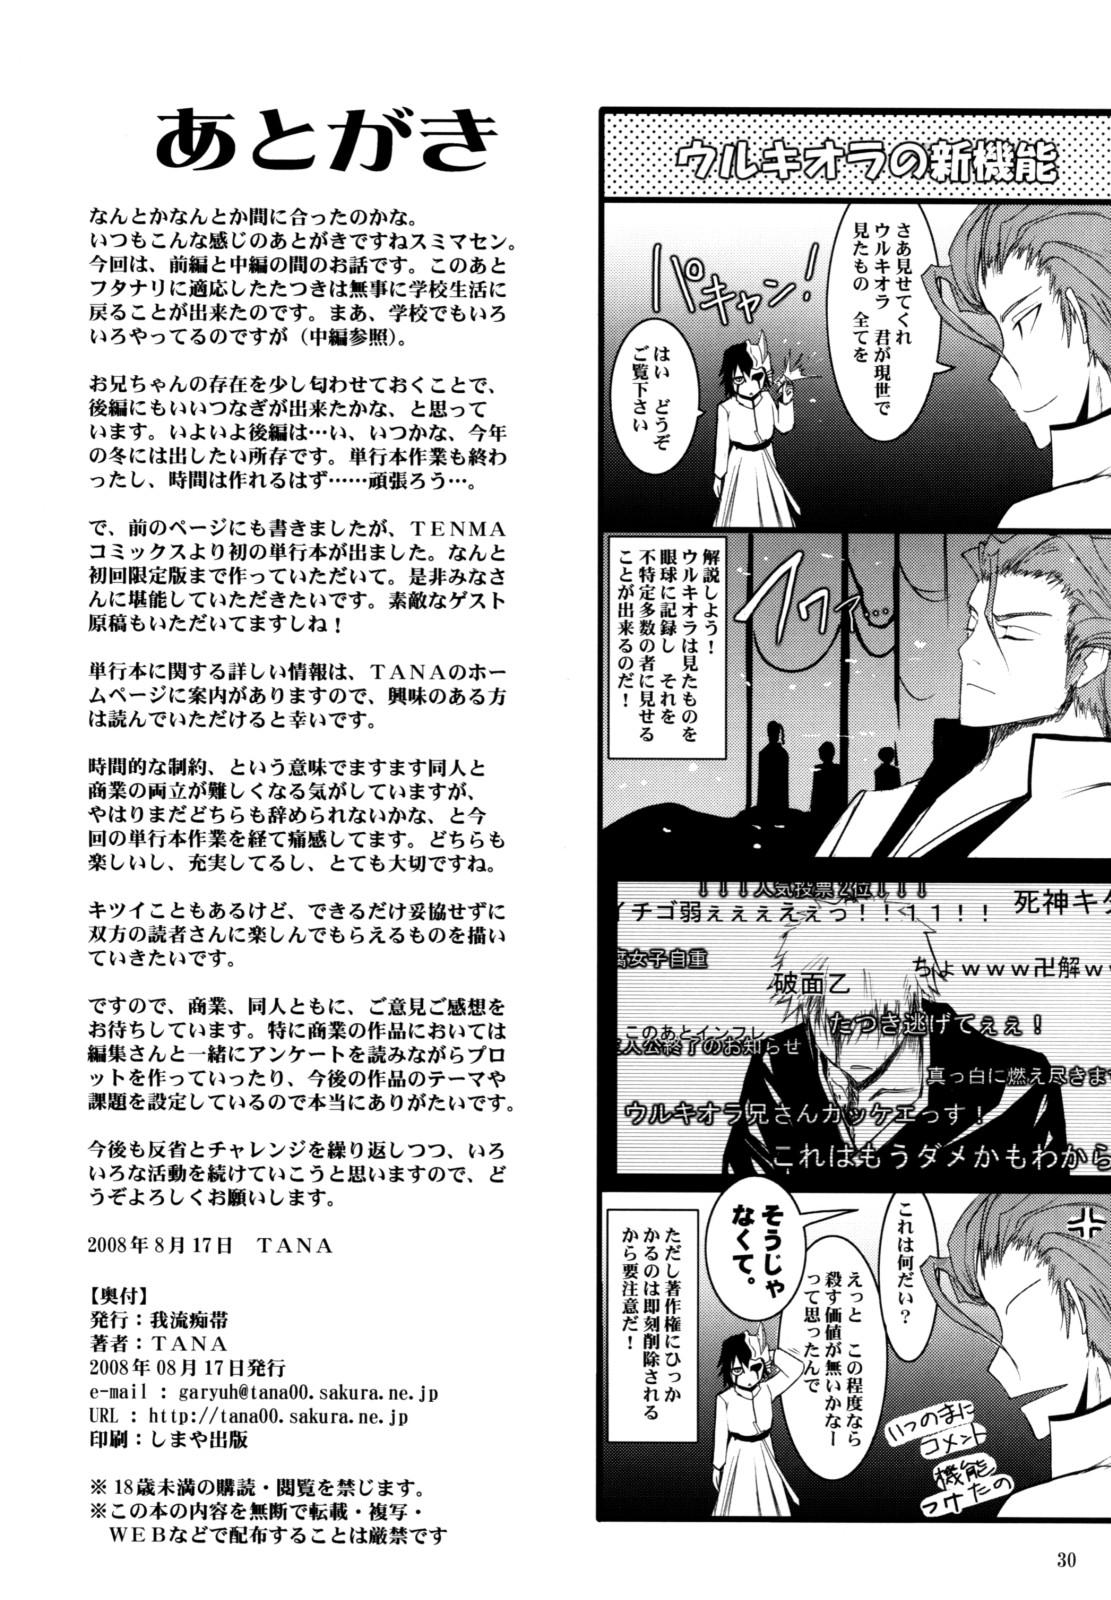 (C74) [Garyuh-Chitai (TANA)] Aki-Akane -ANOTHER DAY- (Bleach) 28